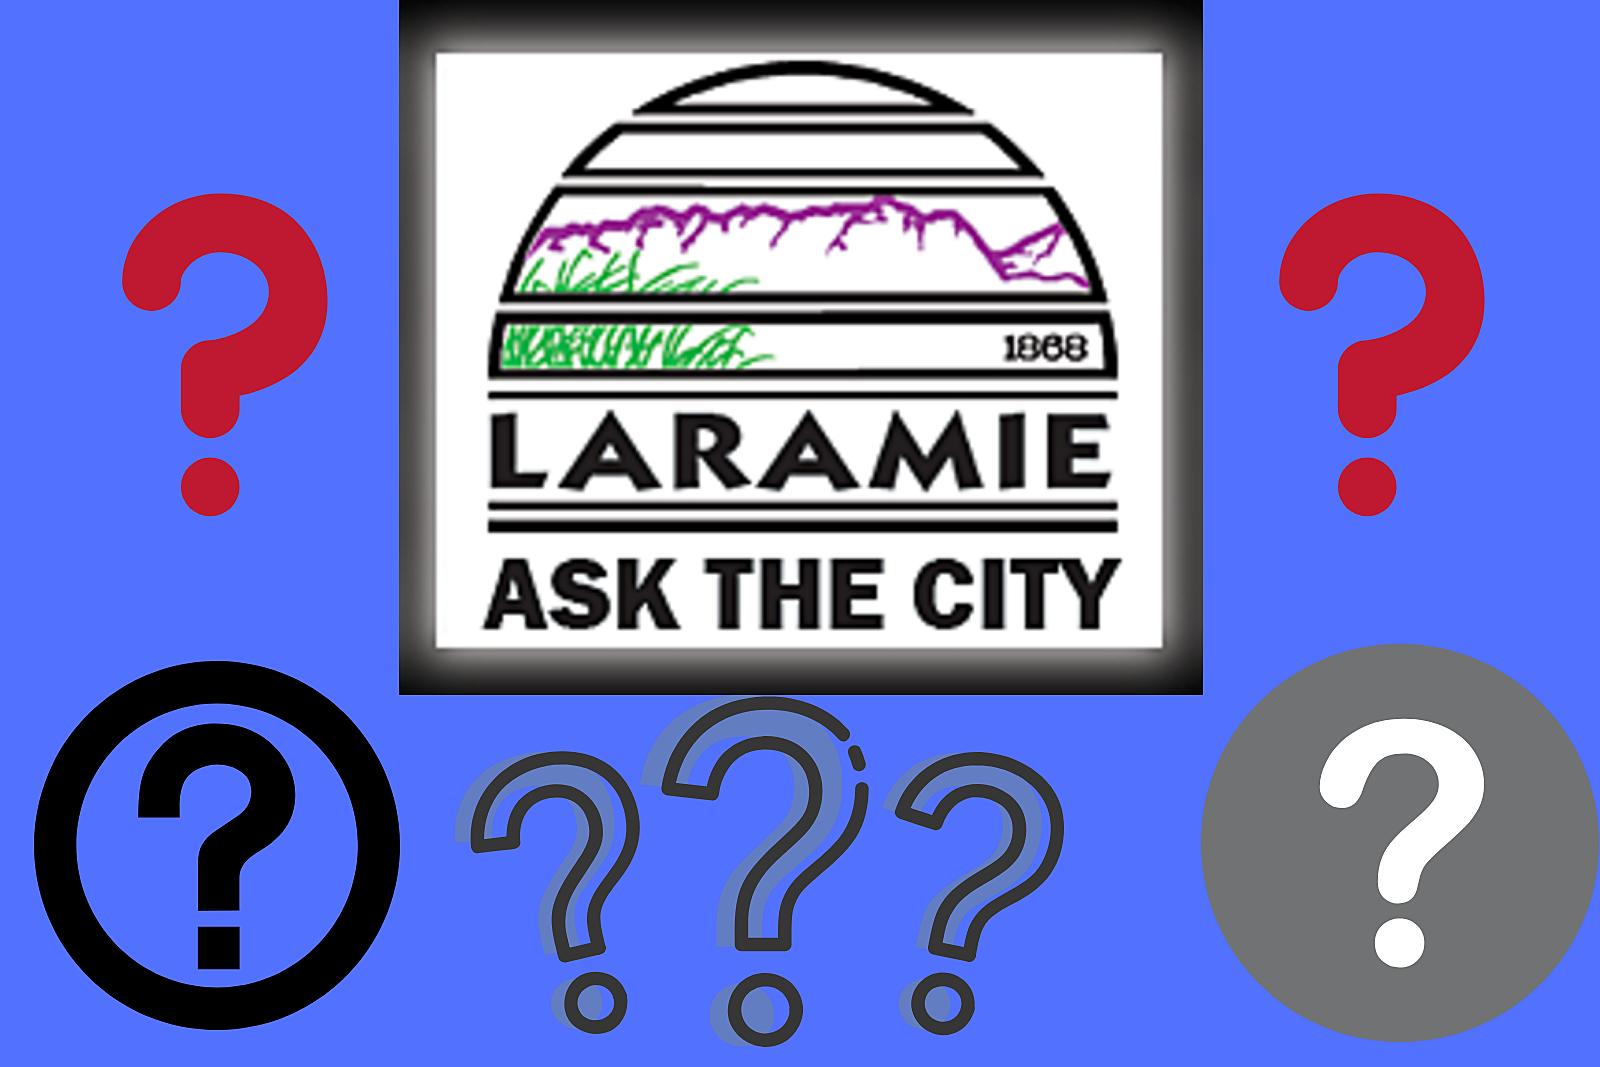 Ask The City Of Laramie - Laramie Live